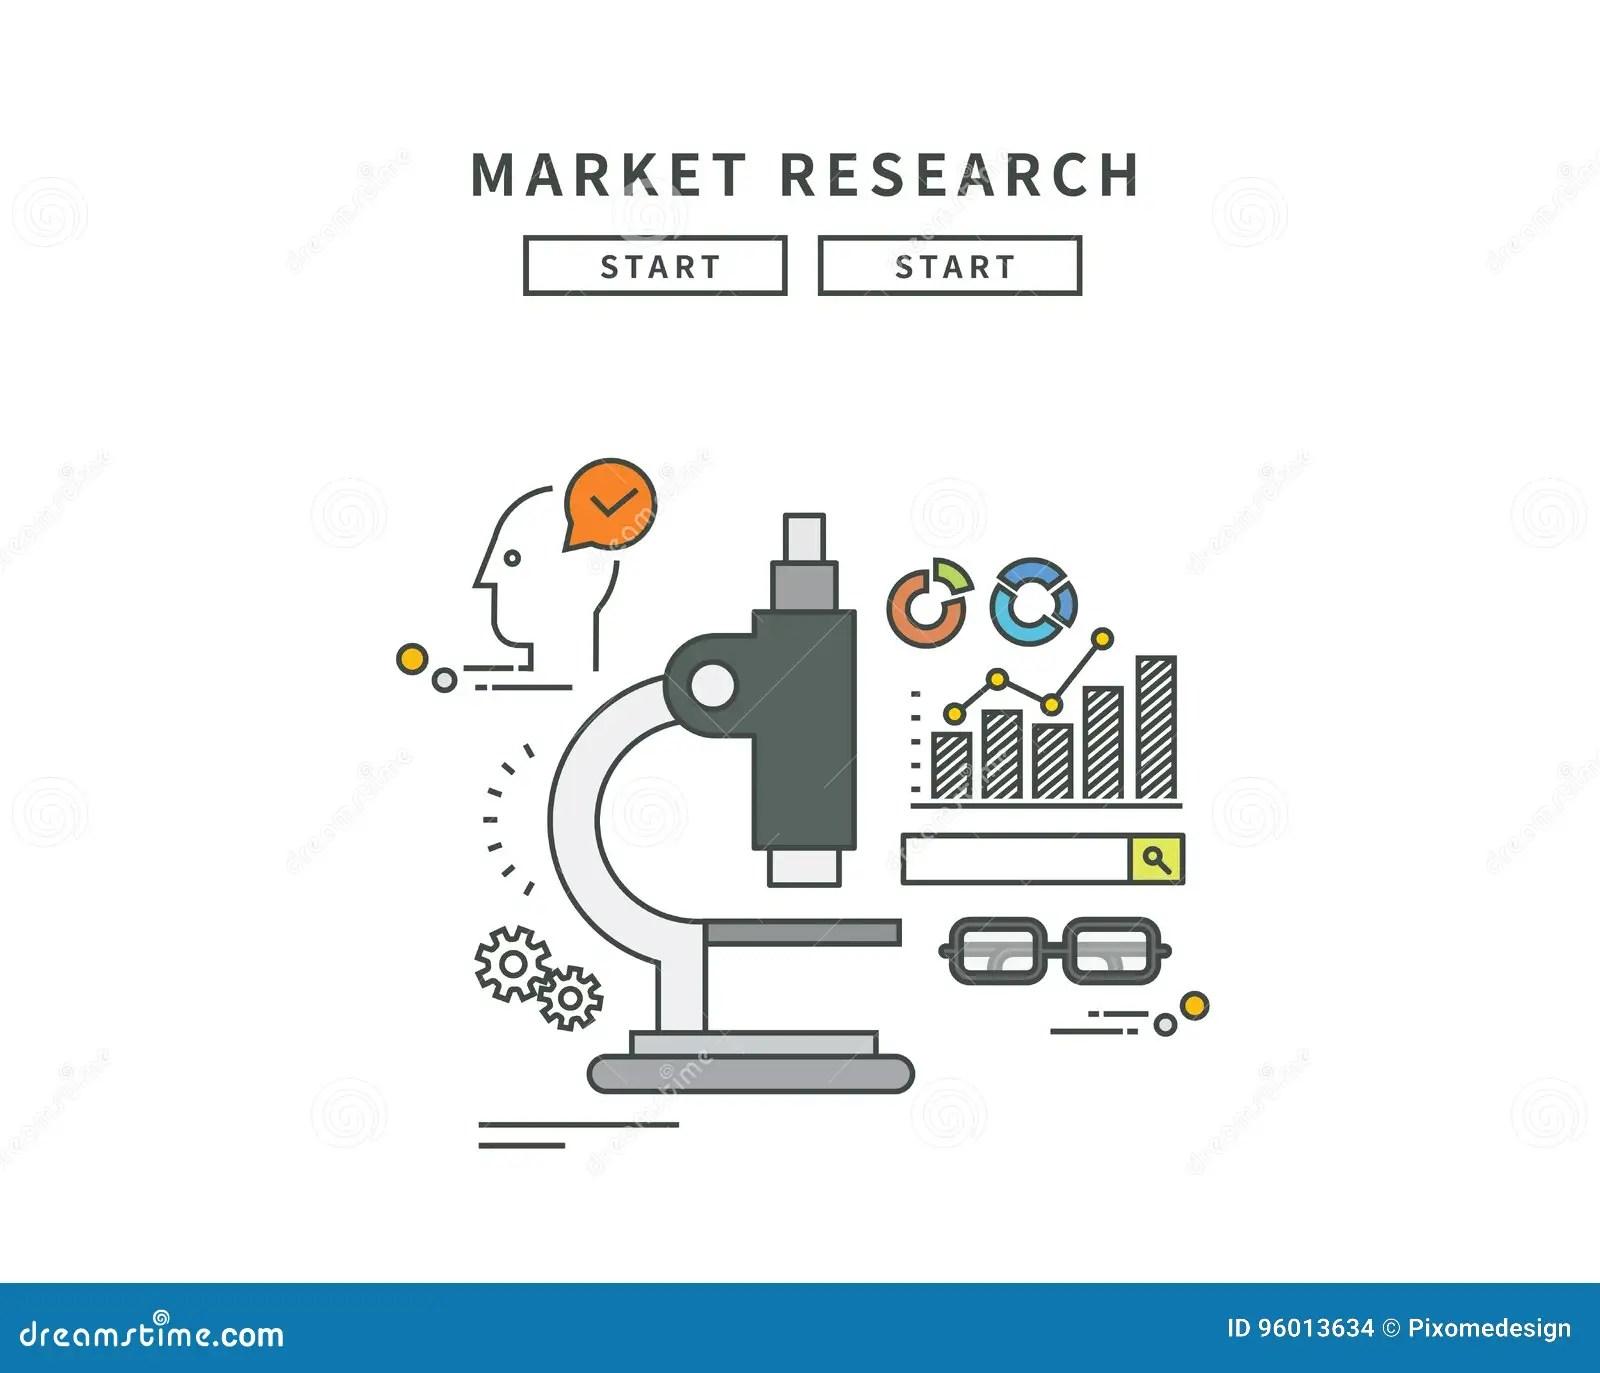 Simple Line Flat Design Of Market Research Modern